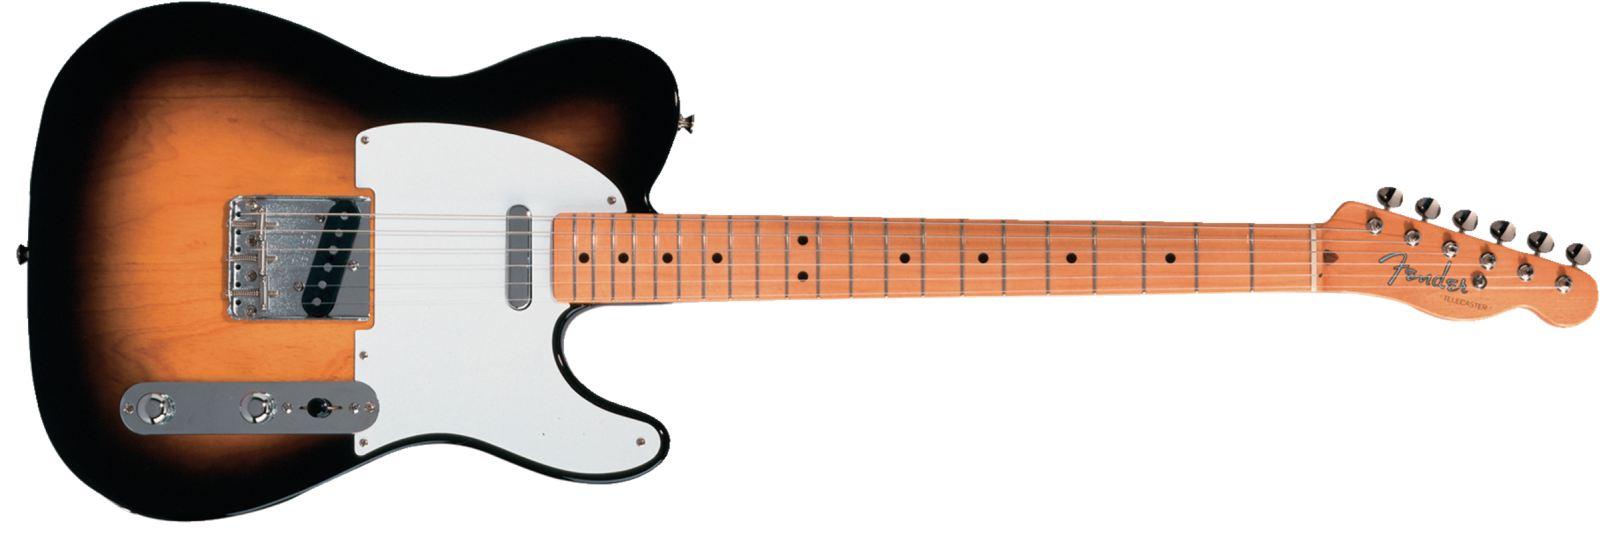 Fender Telecaster 50 Classic MN-2TS